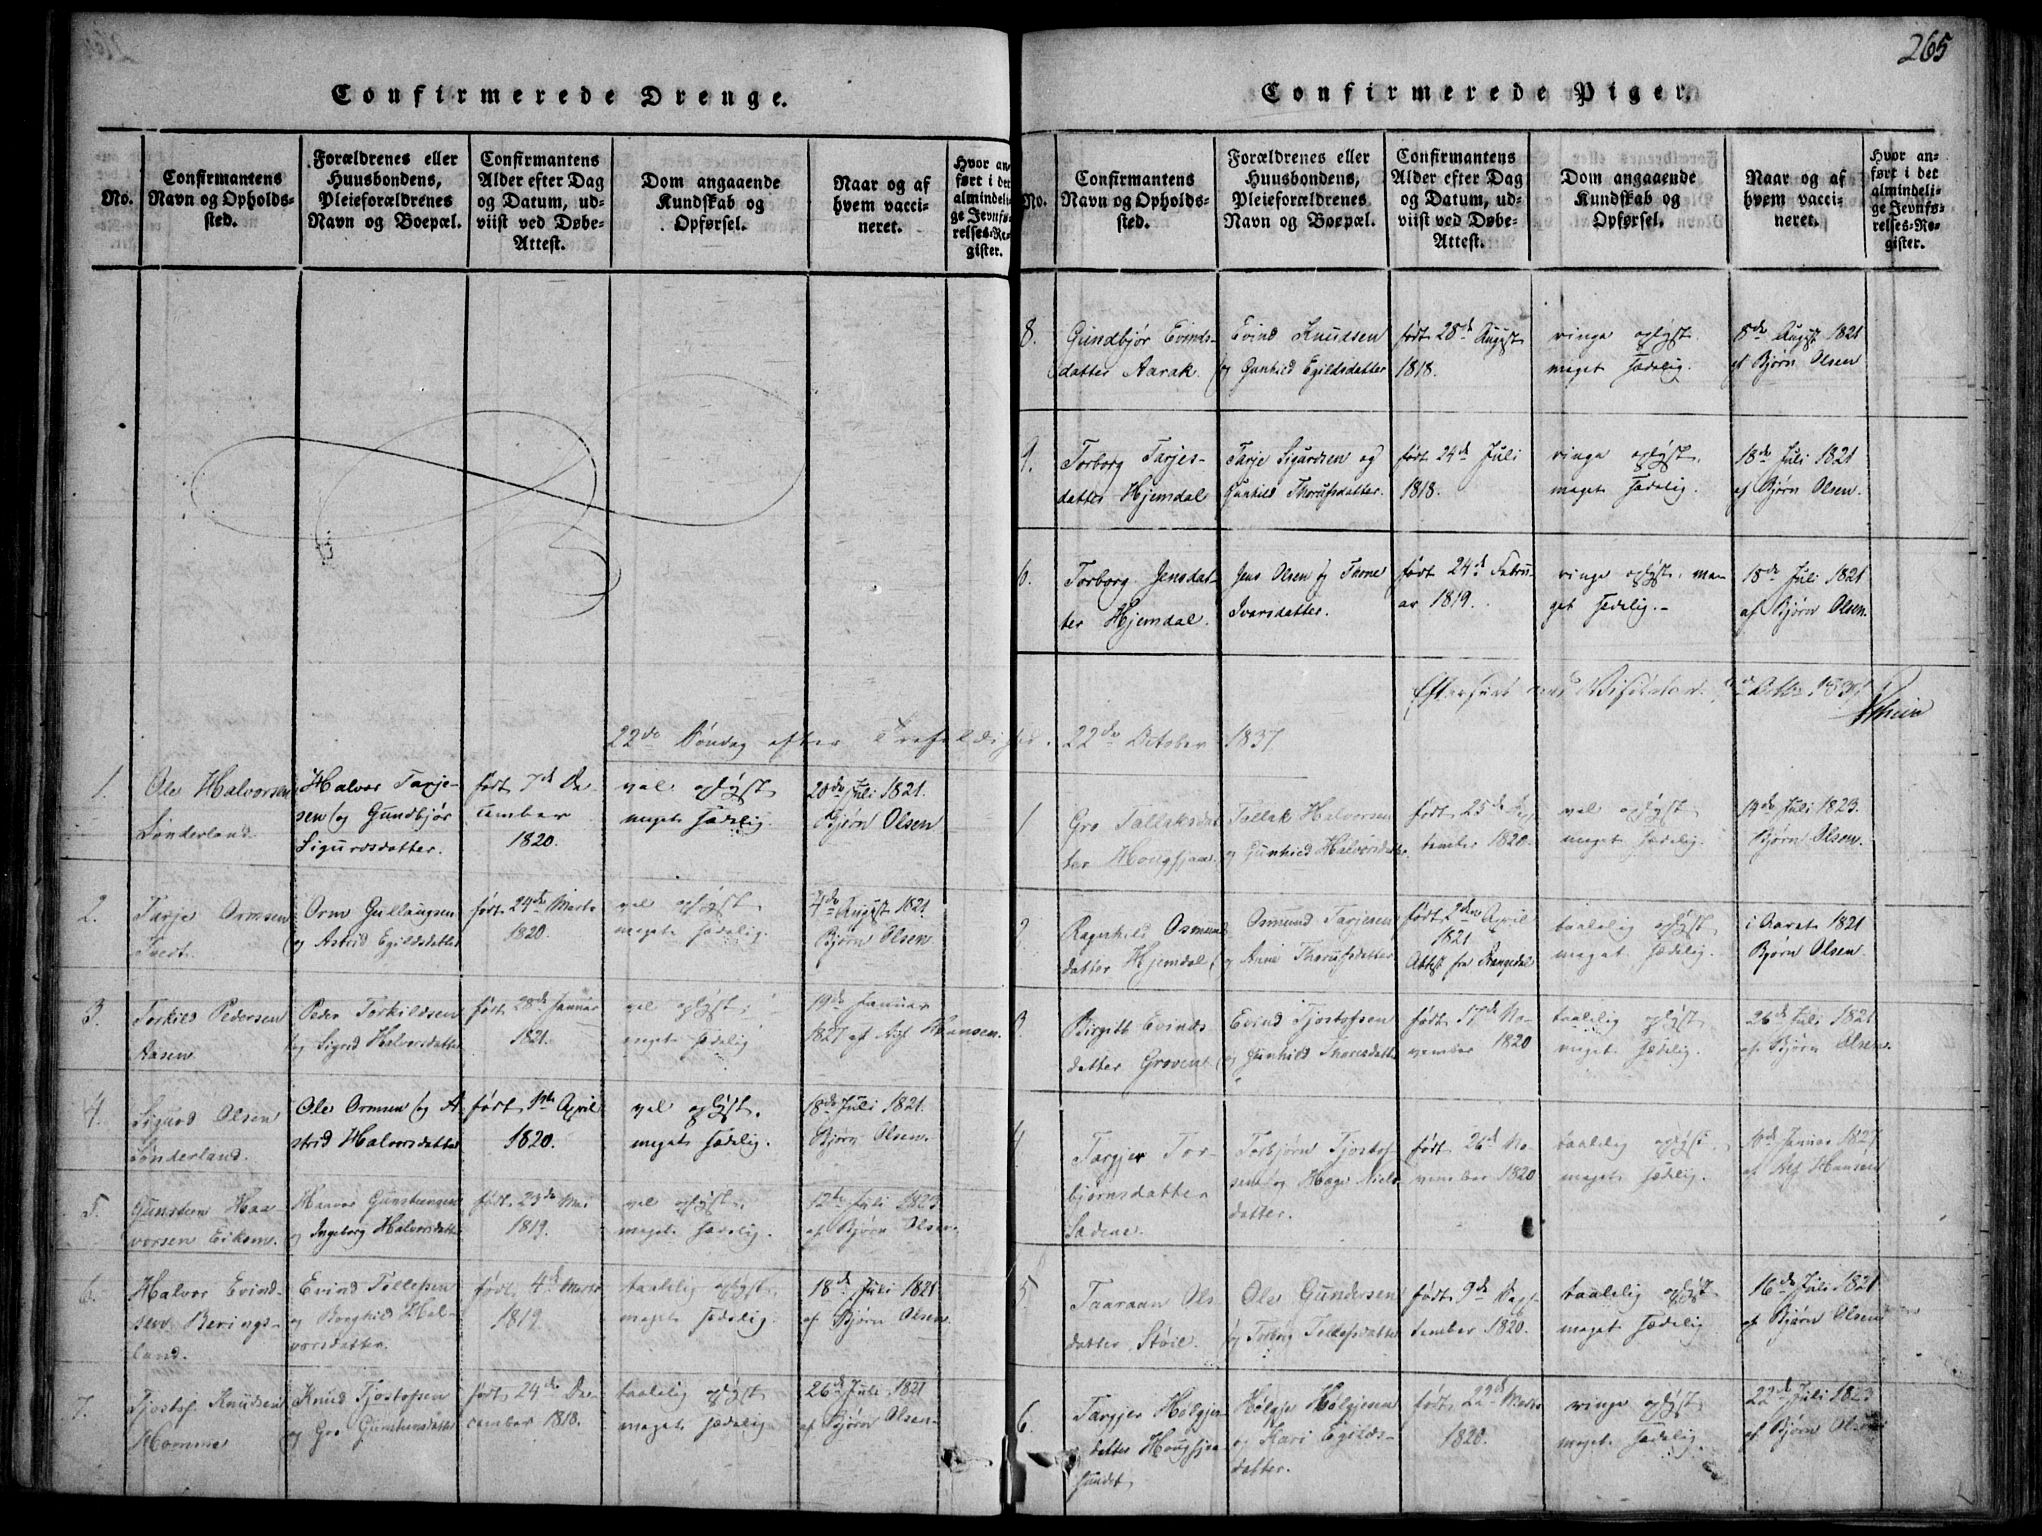 SAKO, Nissedal kirkebøker, F/Fb/L0001: Ministerialbok nr. II 1, 1814-1845, s. 265